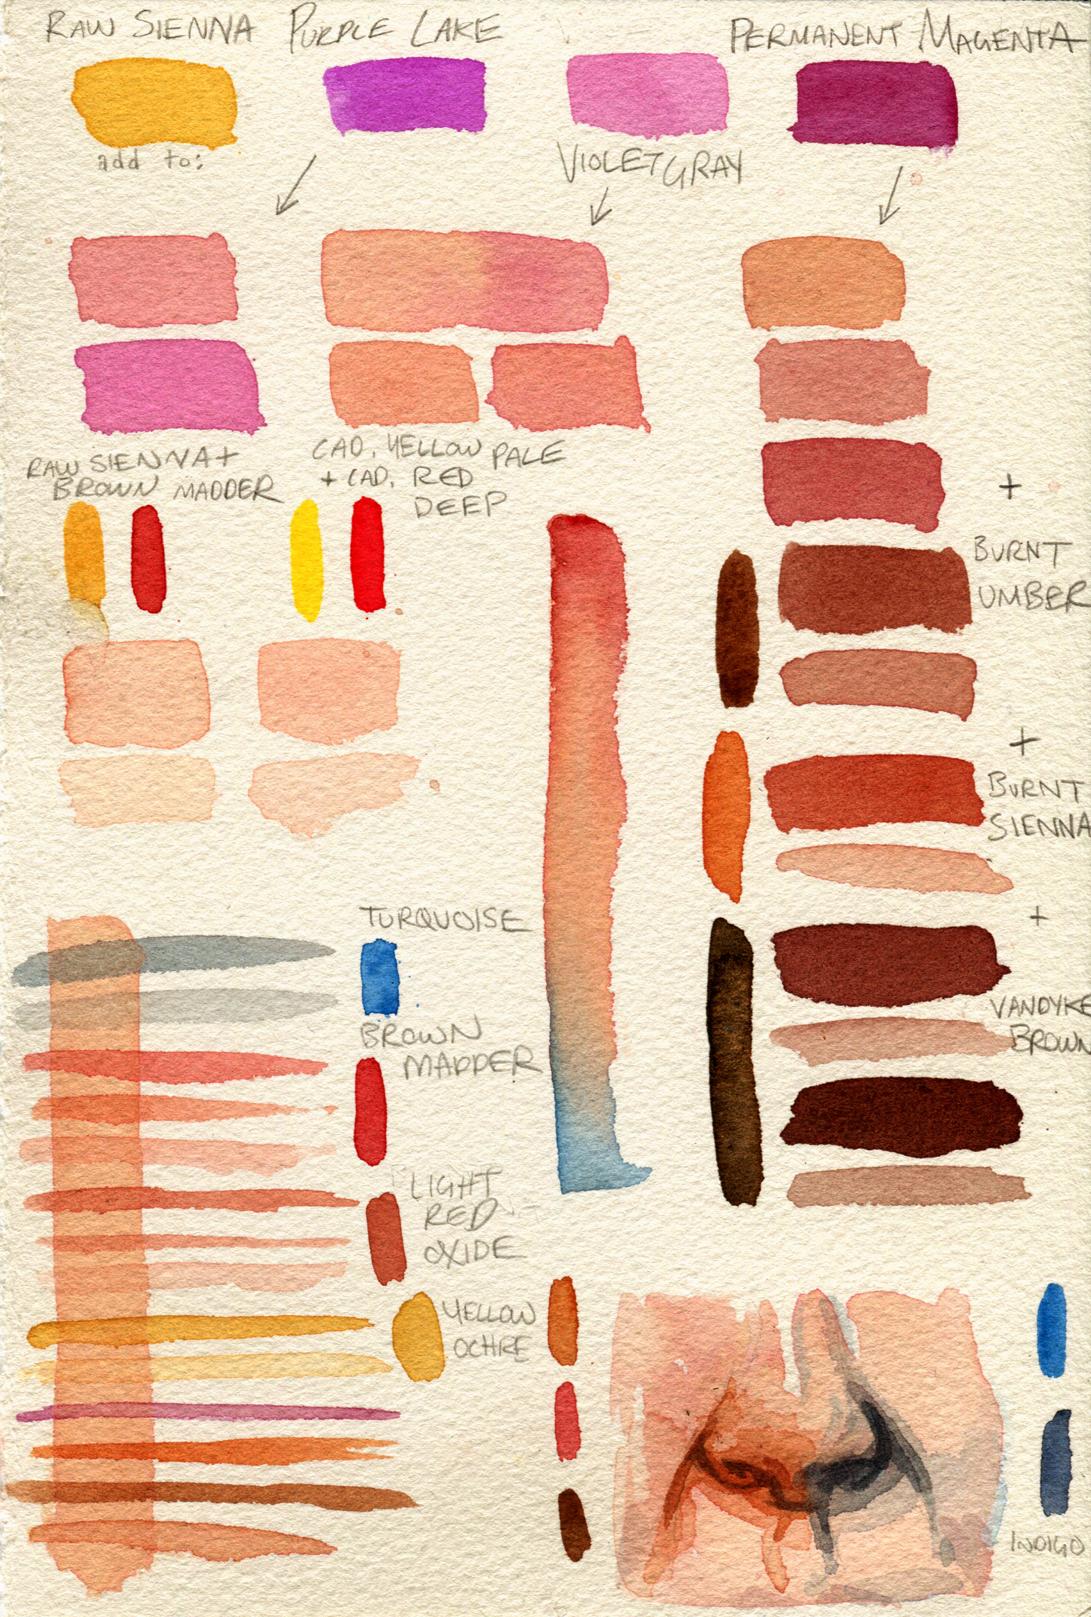 watercolour sheet discoveries in mixing skin tones